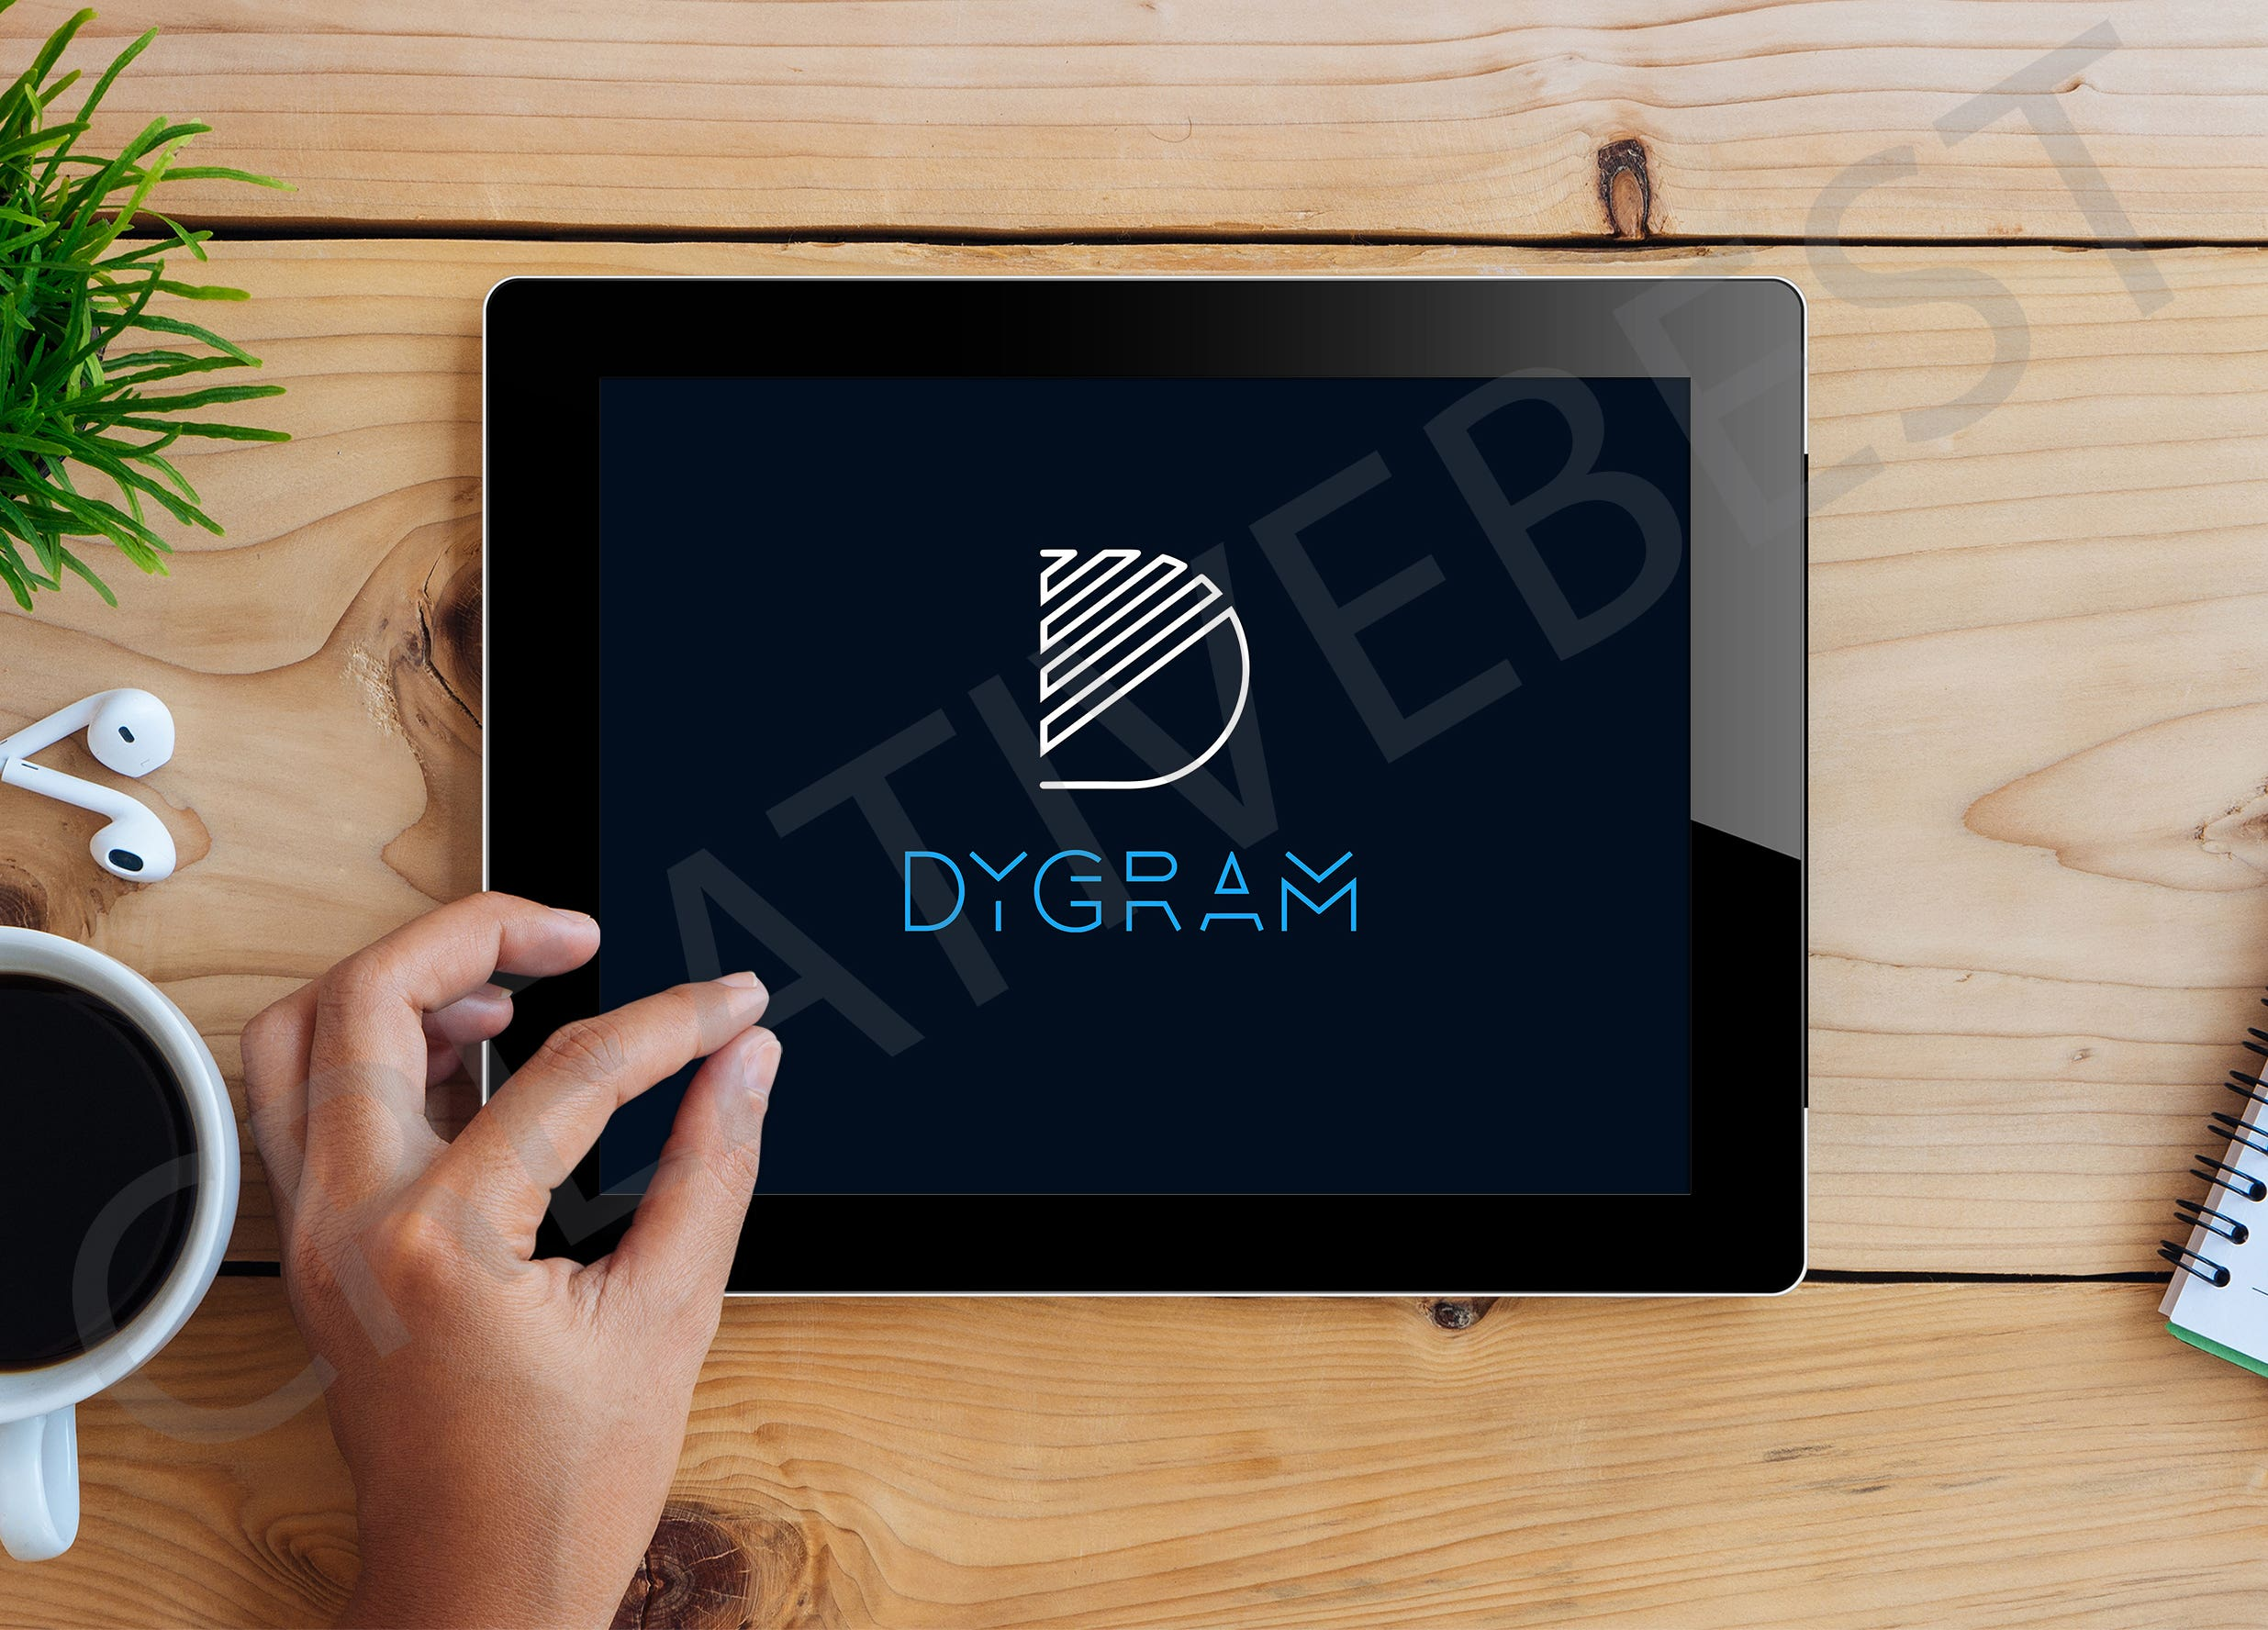 Dygram logo